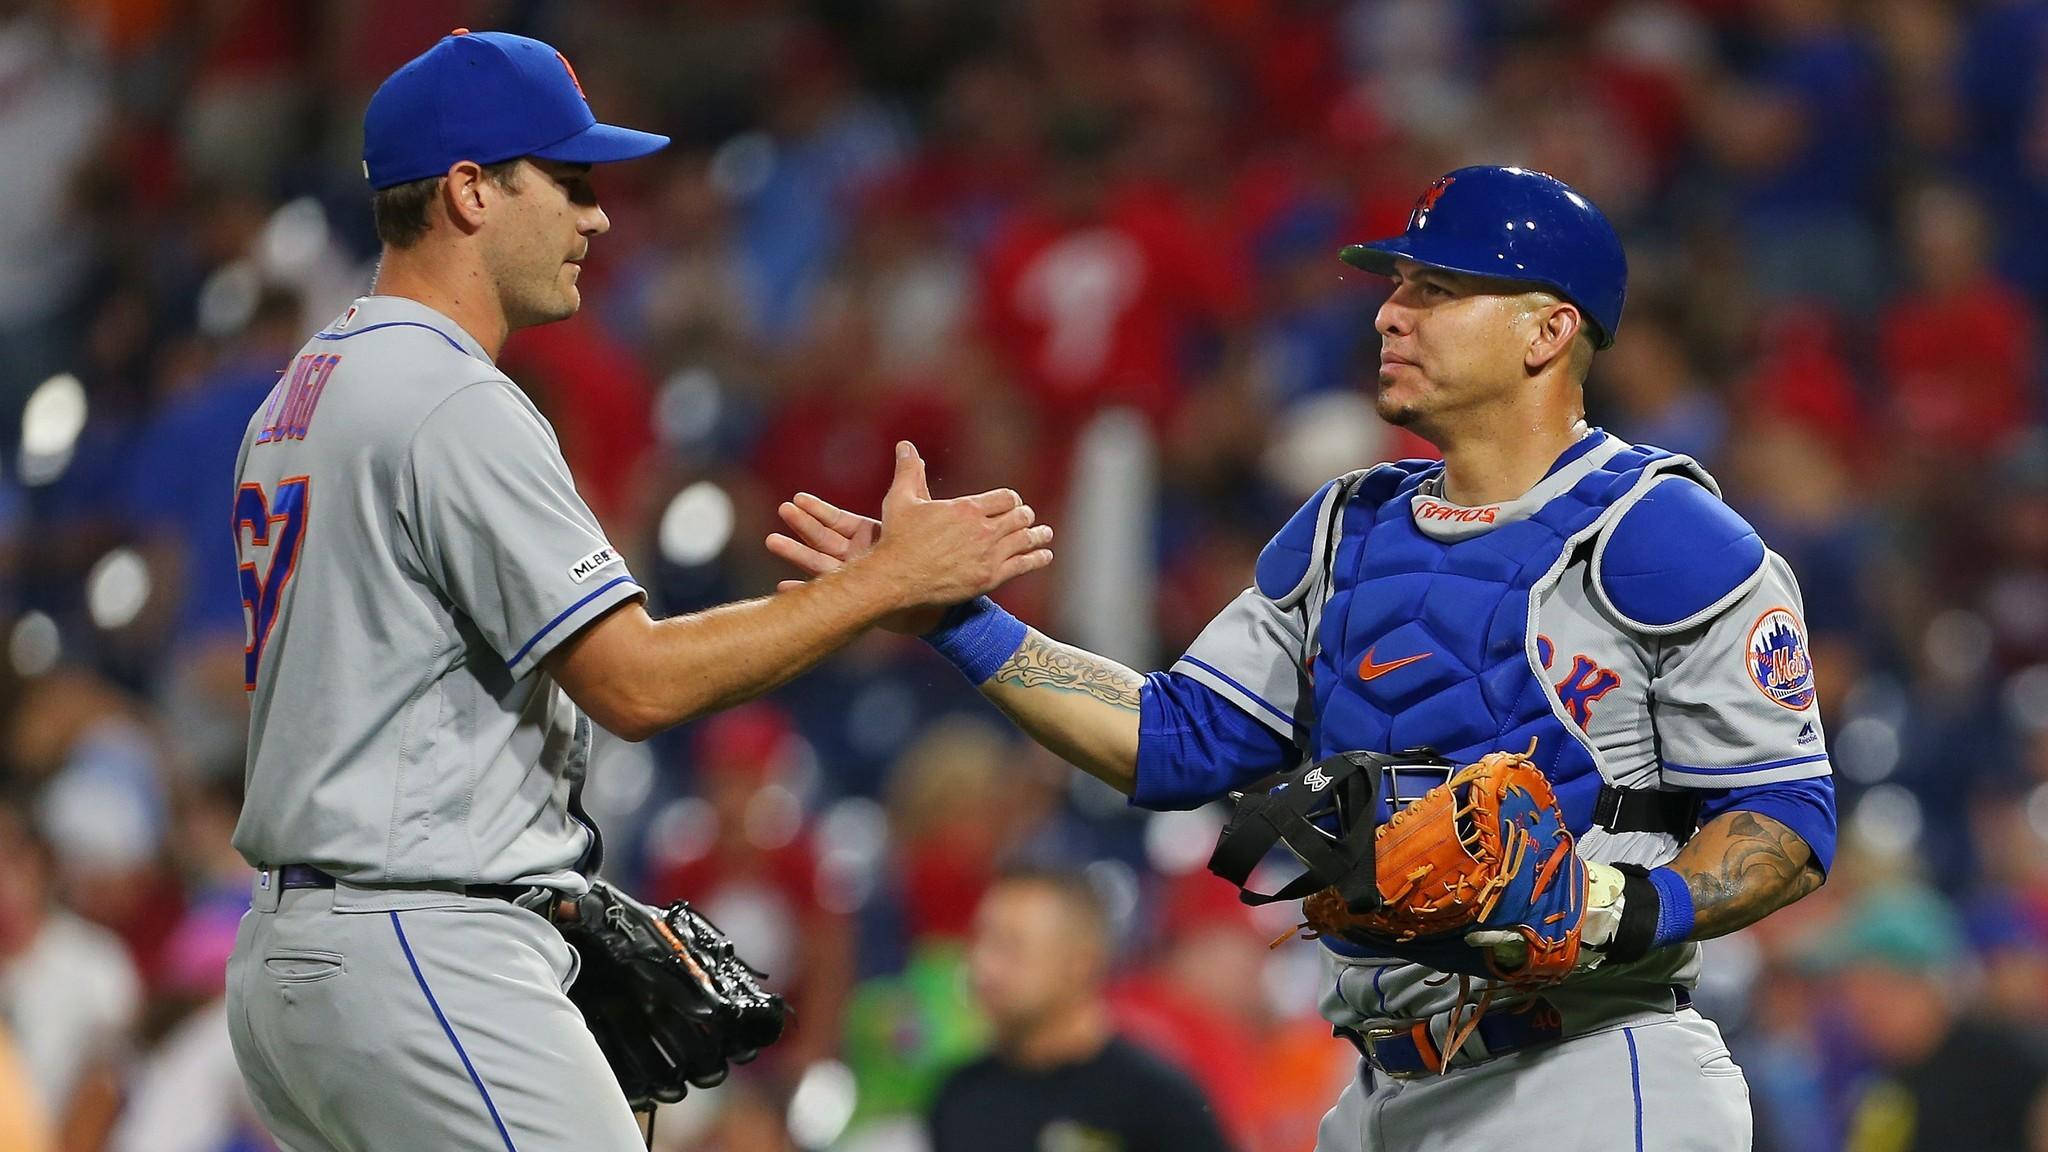 Mets bullpen fresh for critical Dodgers series